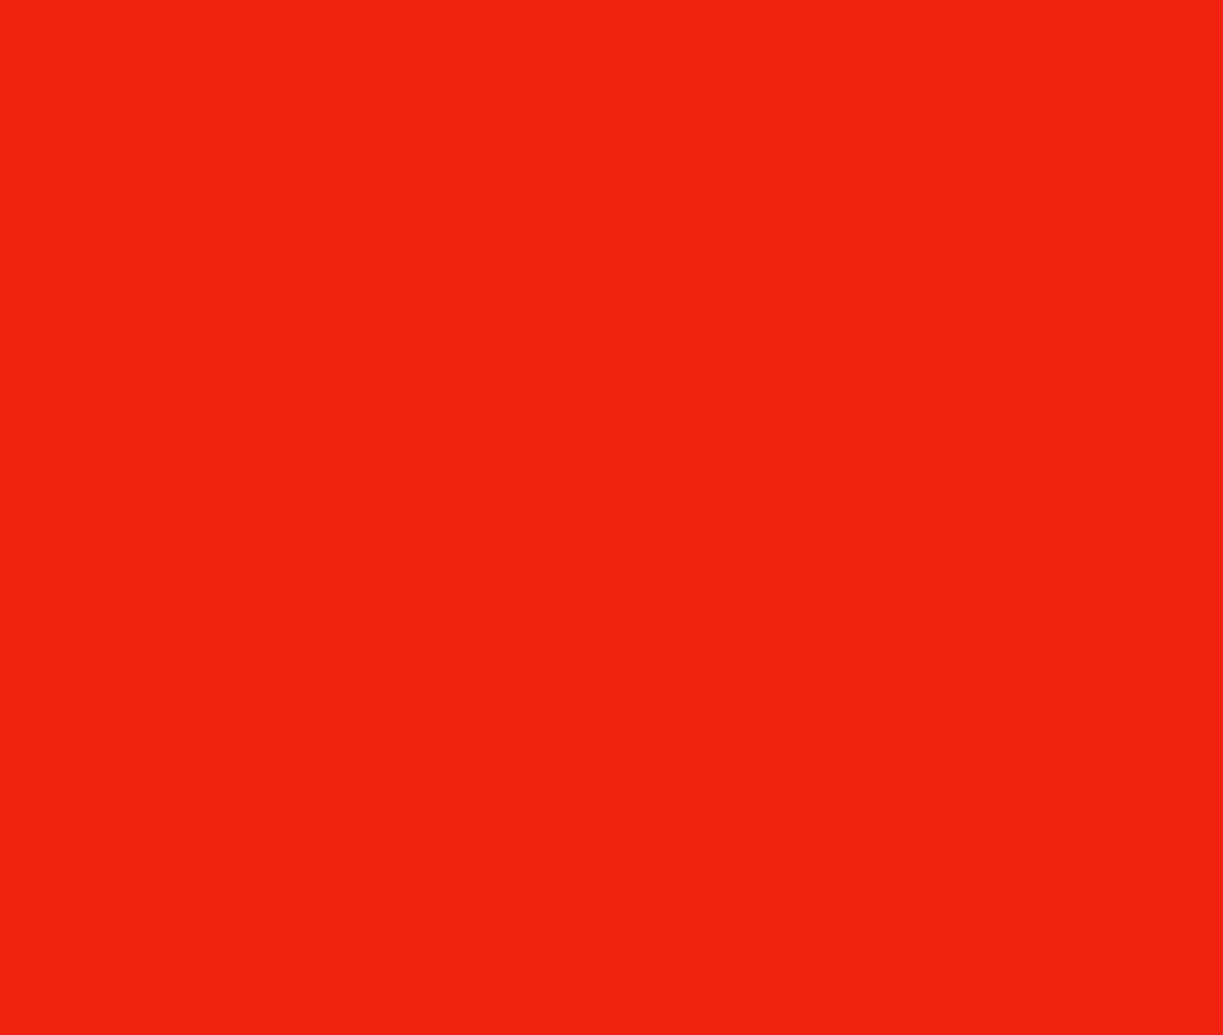 Logo Carton Cajon